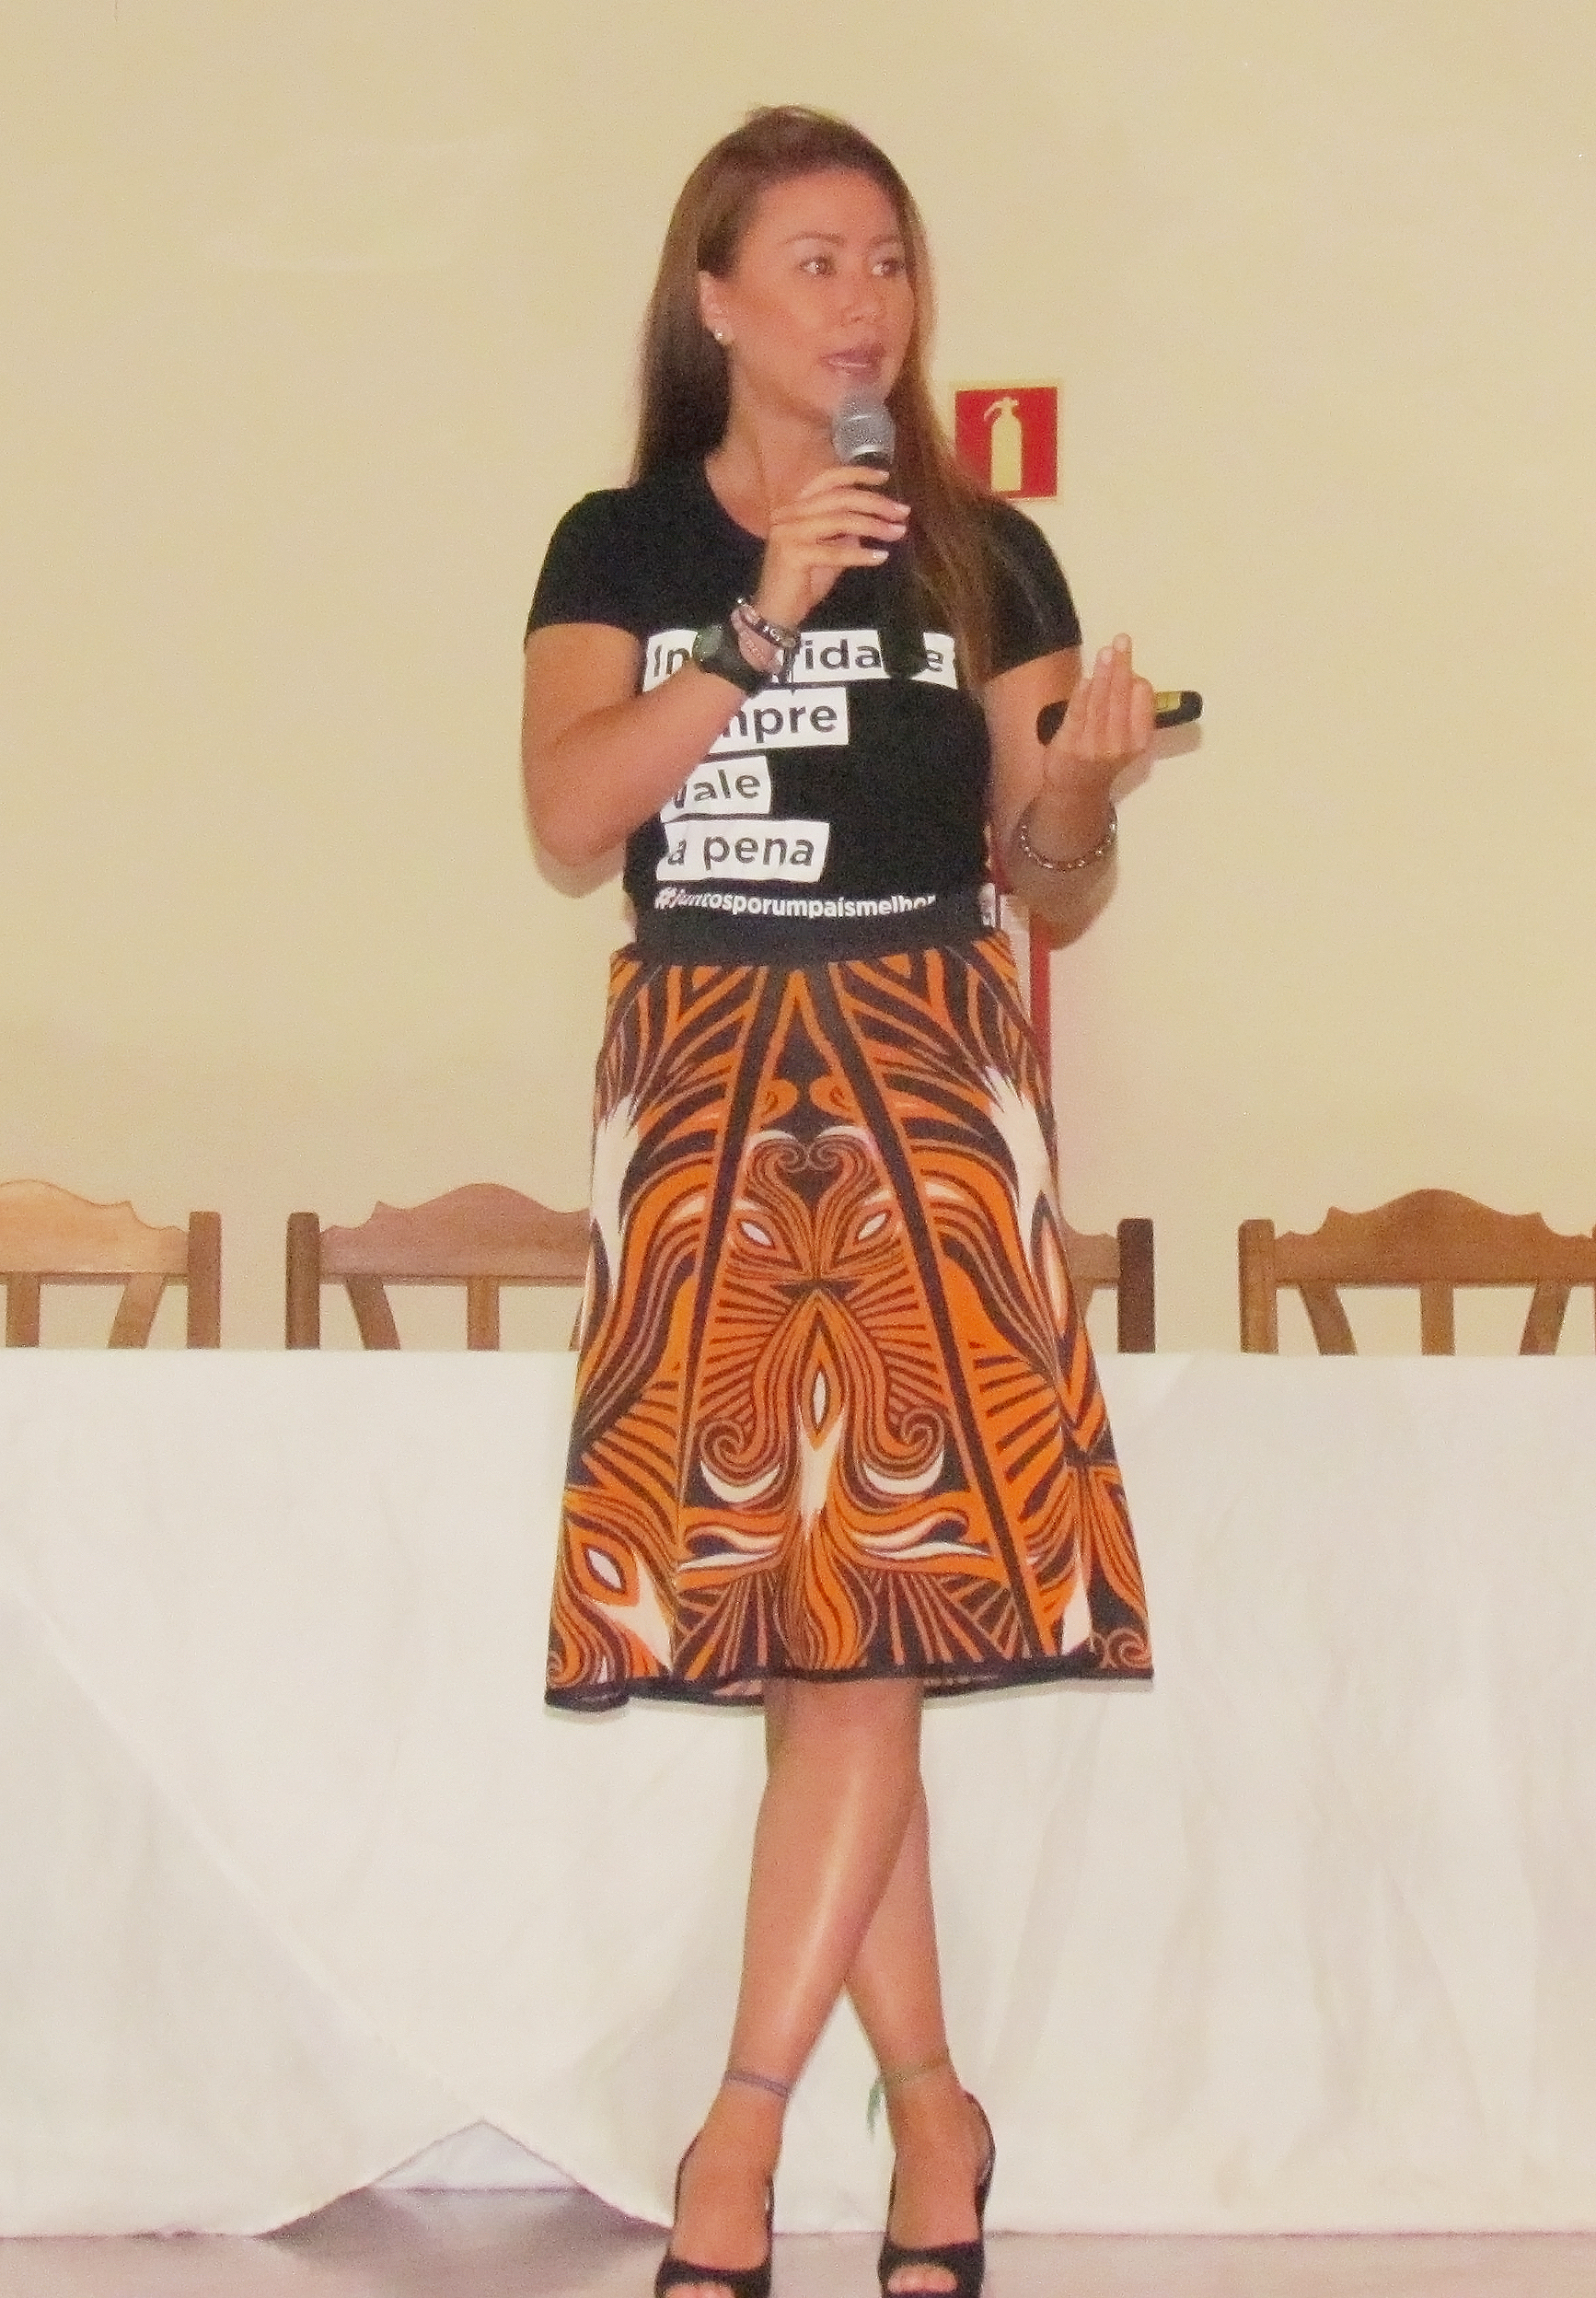 Letícia Sugai palestra Guarapuava